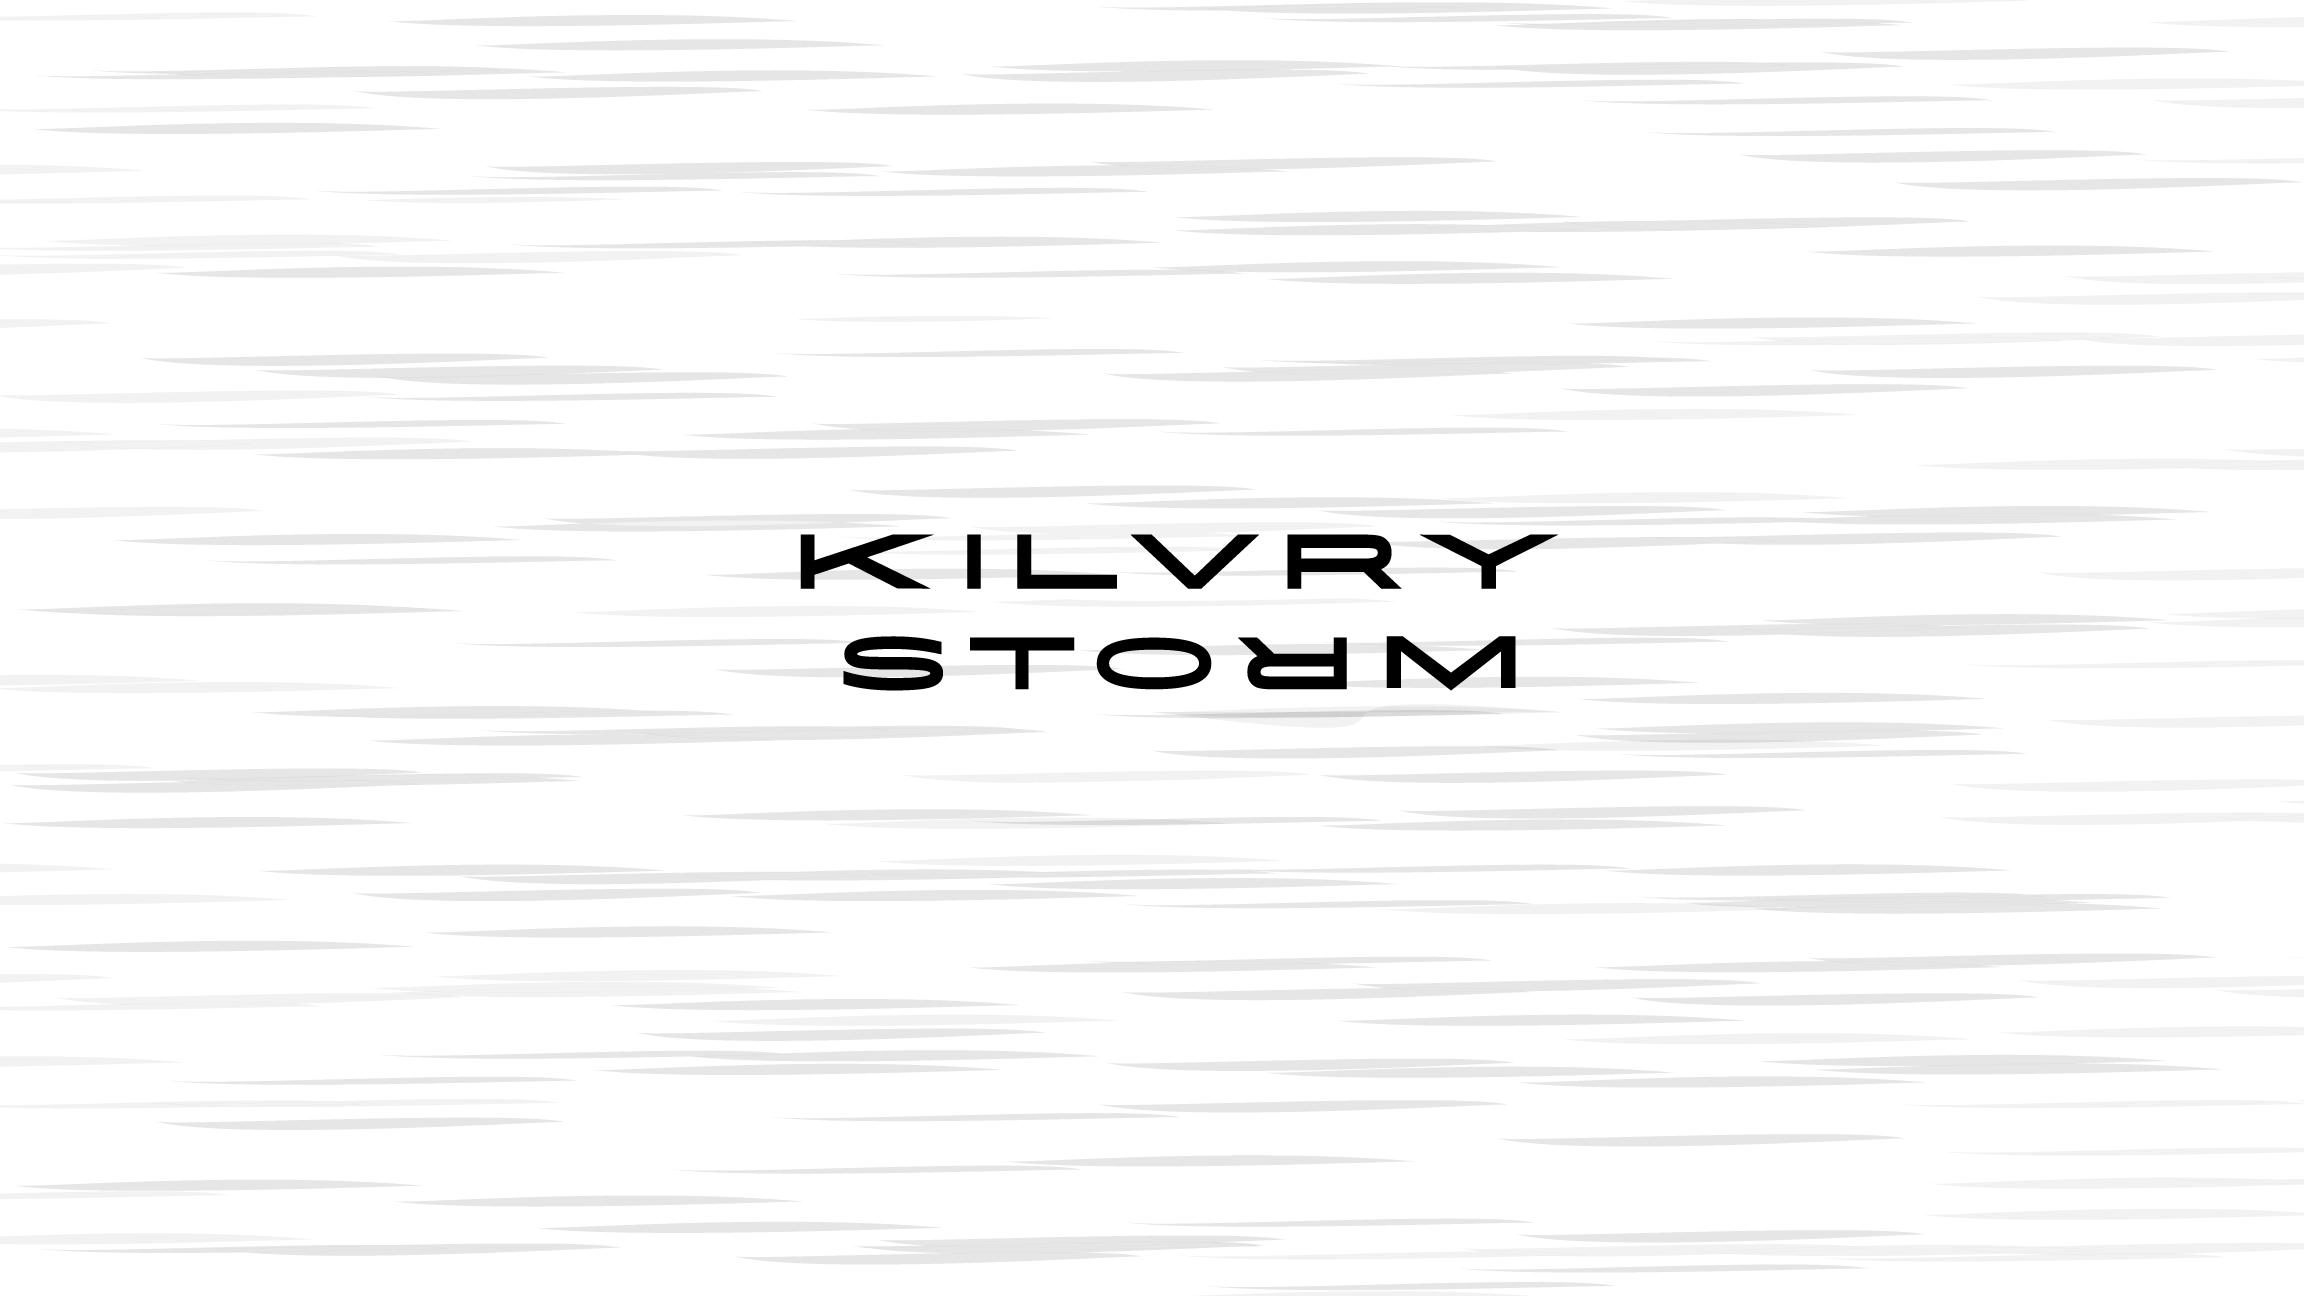 Kilvry Storm - A Design Workshop